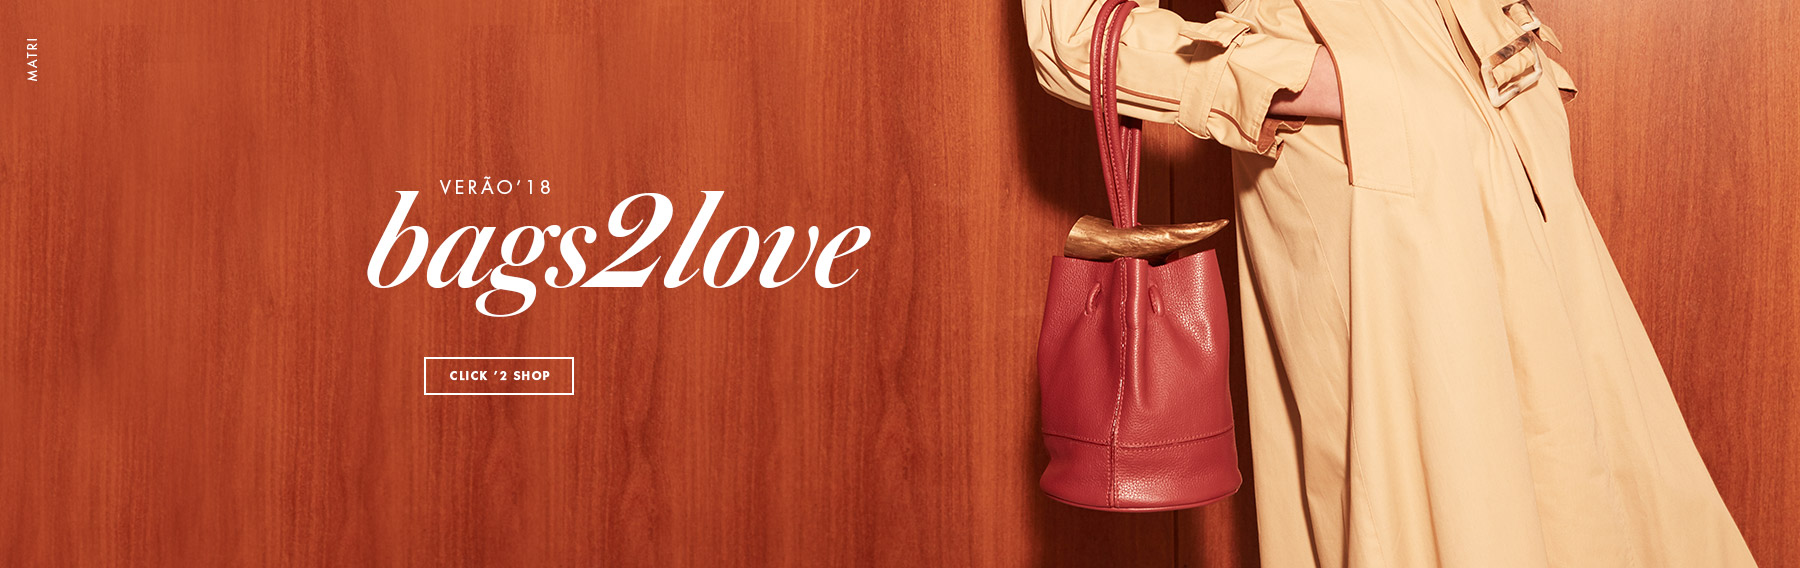 Bag2love